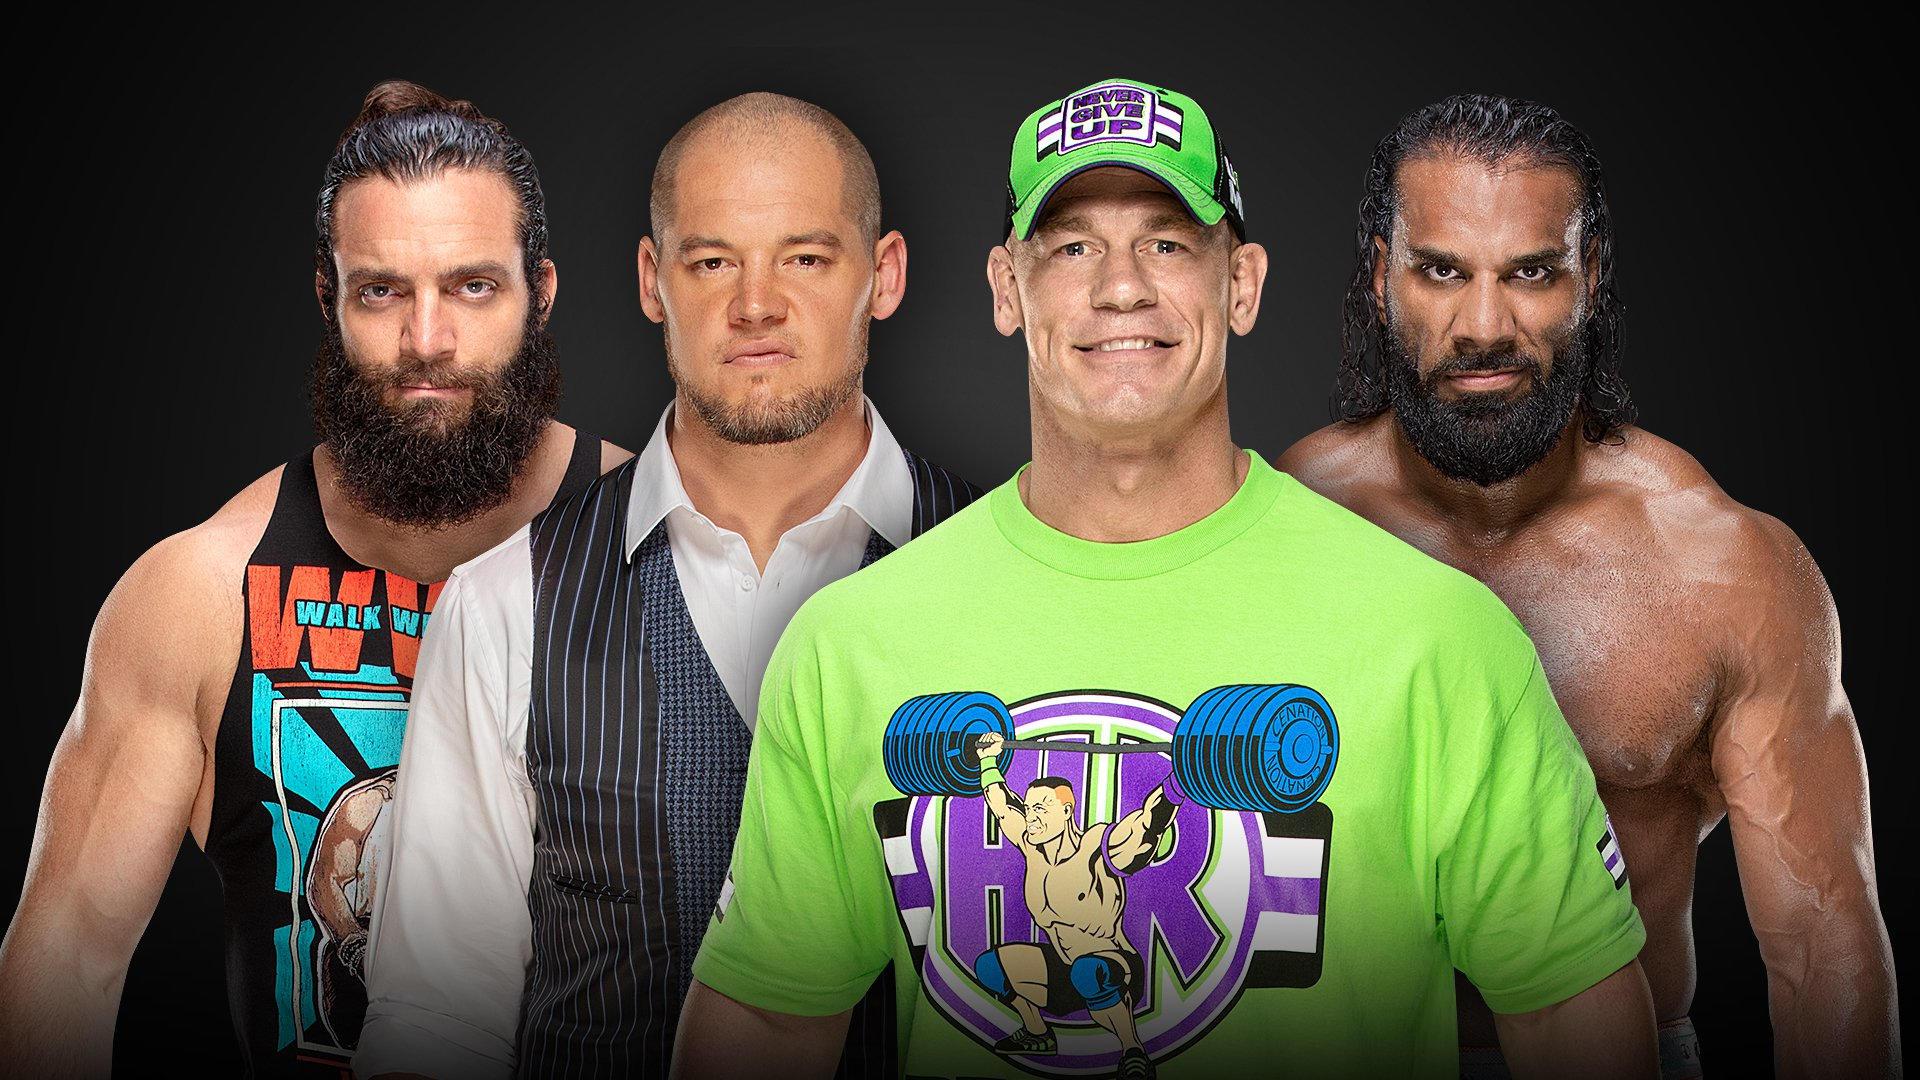 Confirmed and Potential Matches for WWE Royal Rumble 2019 20190107_RoyalRumble_temp_EliasCorbinCenaJinder--f80405890377b9b9442d3062f08ec4b8